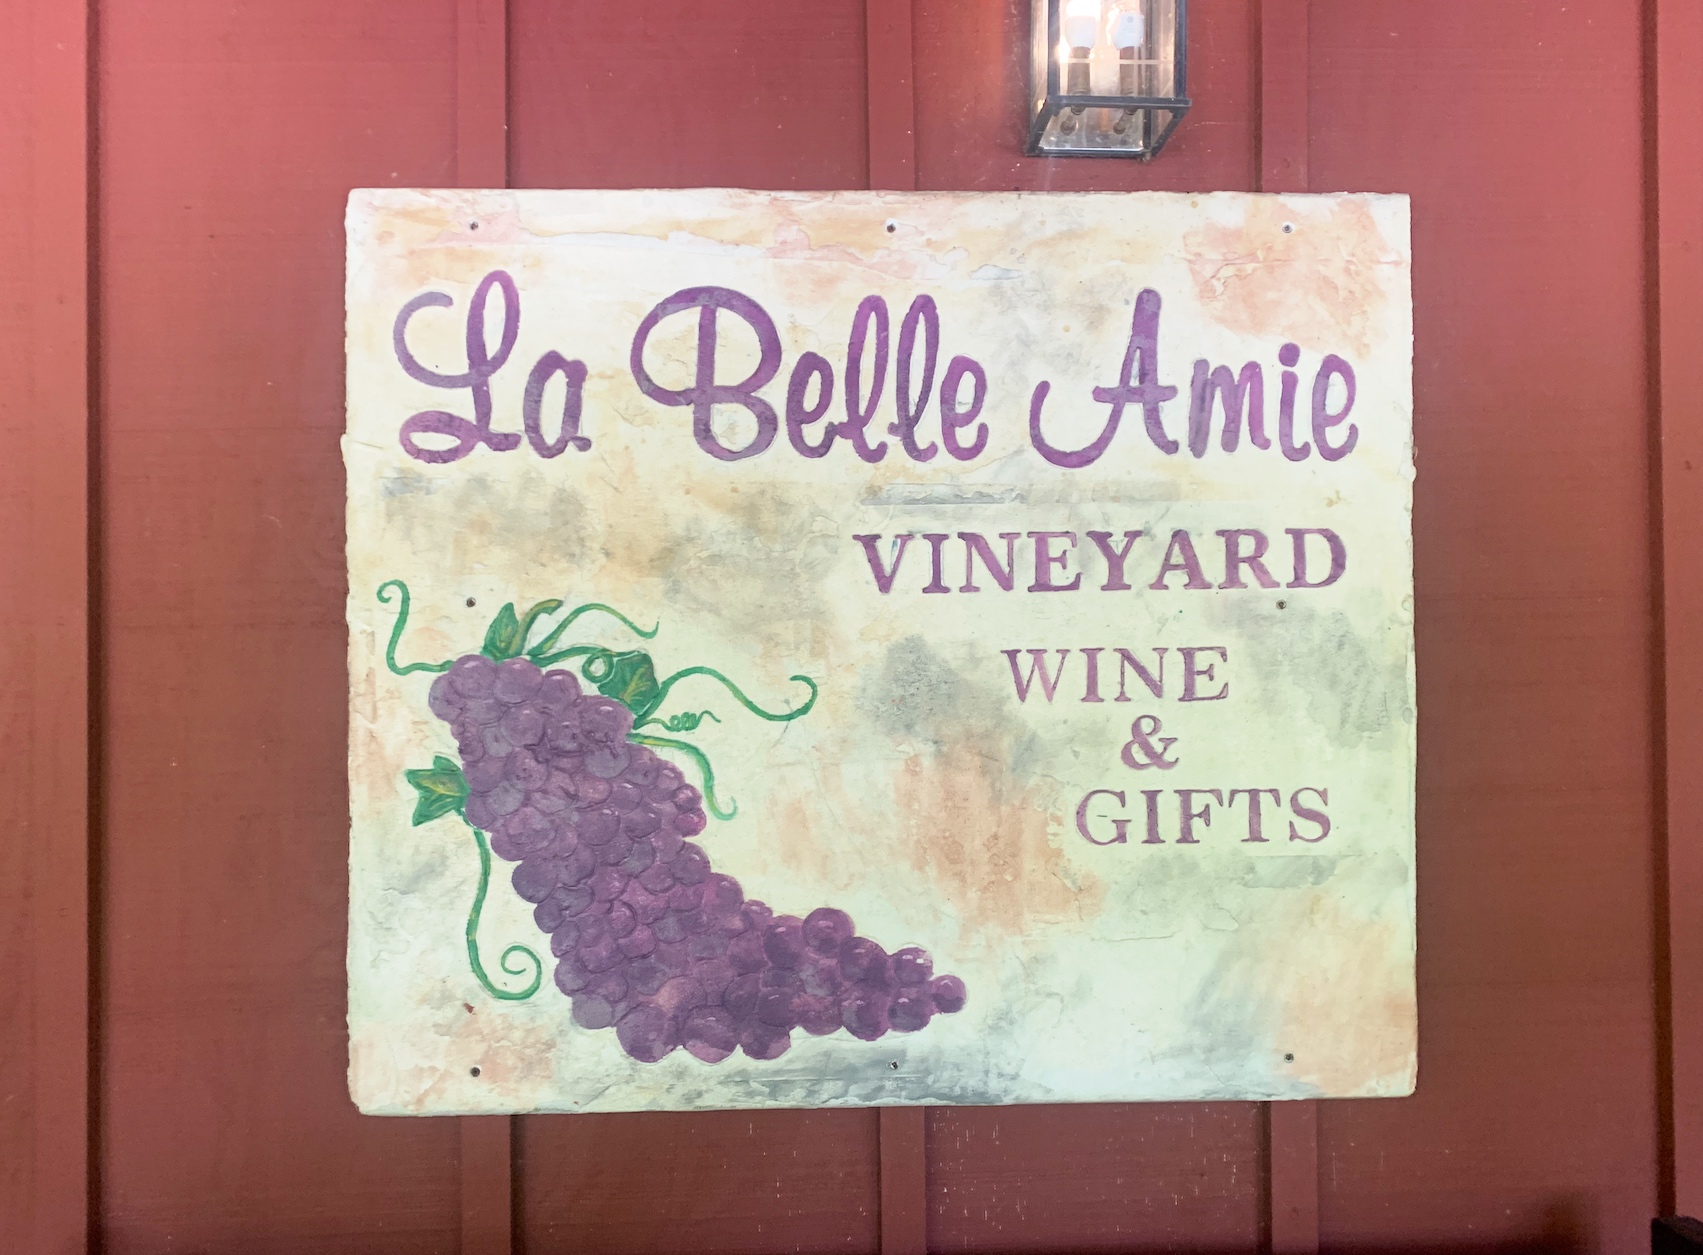 La Belle Amie Vineyard Wine and Gifts. Myrtle Beach, SC. Myrtle Beach Winery